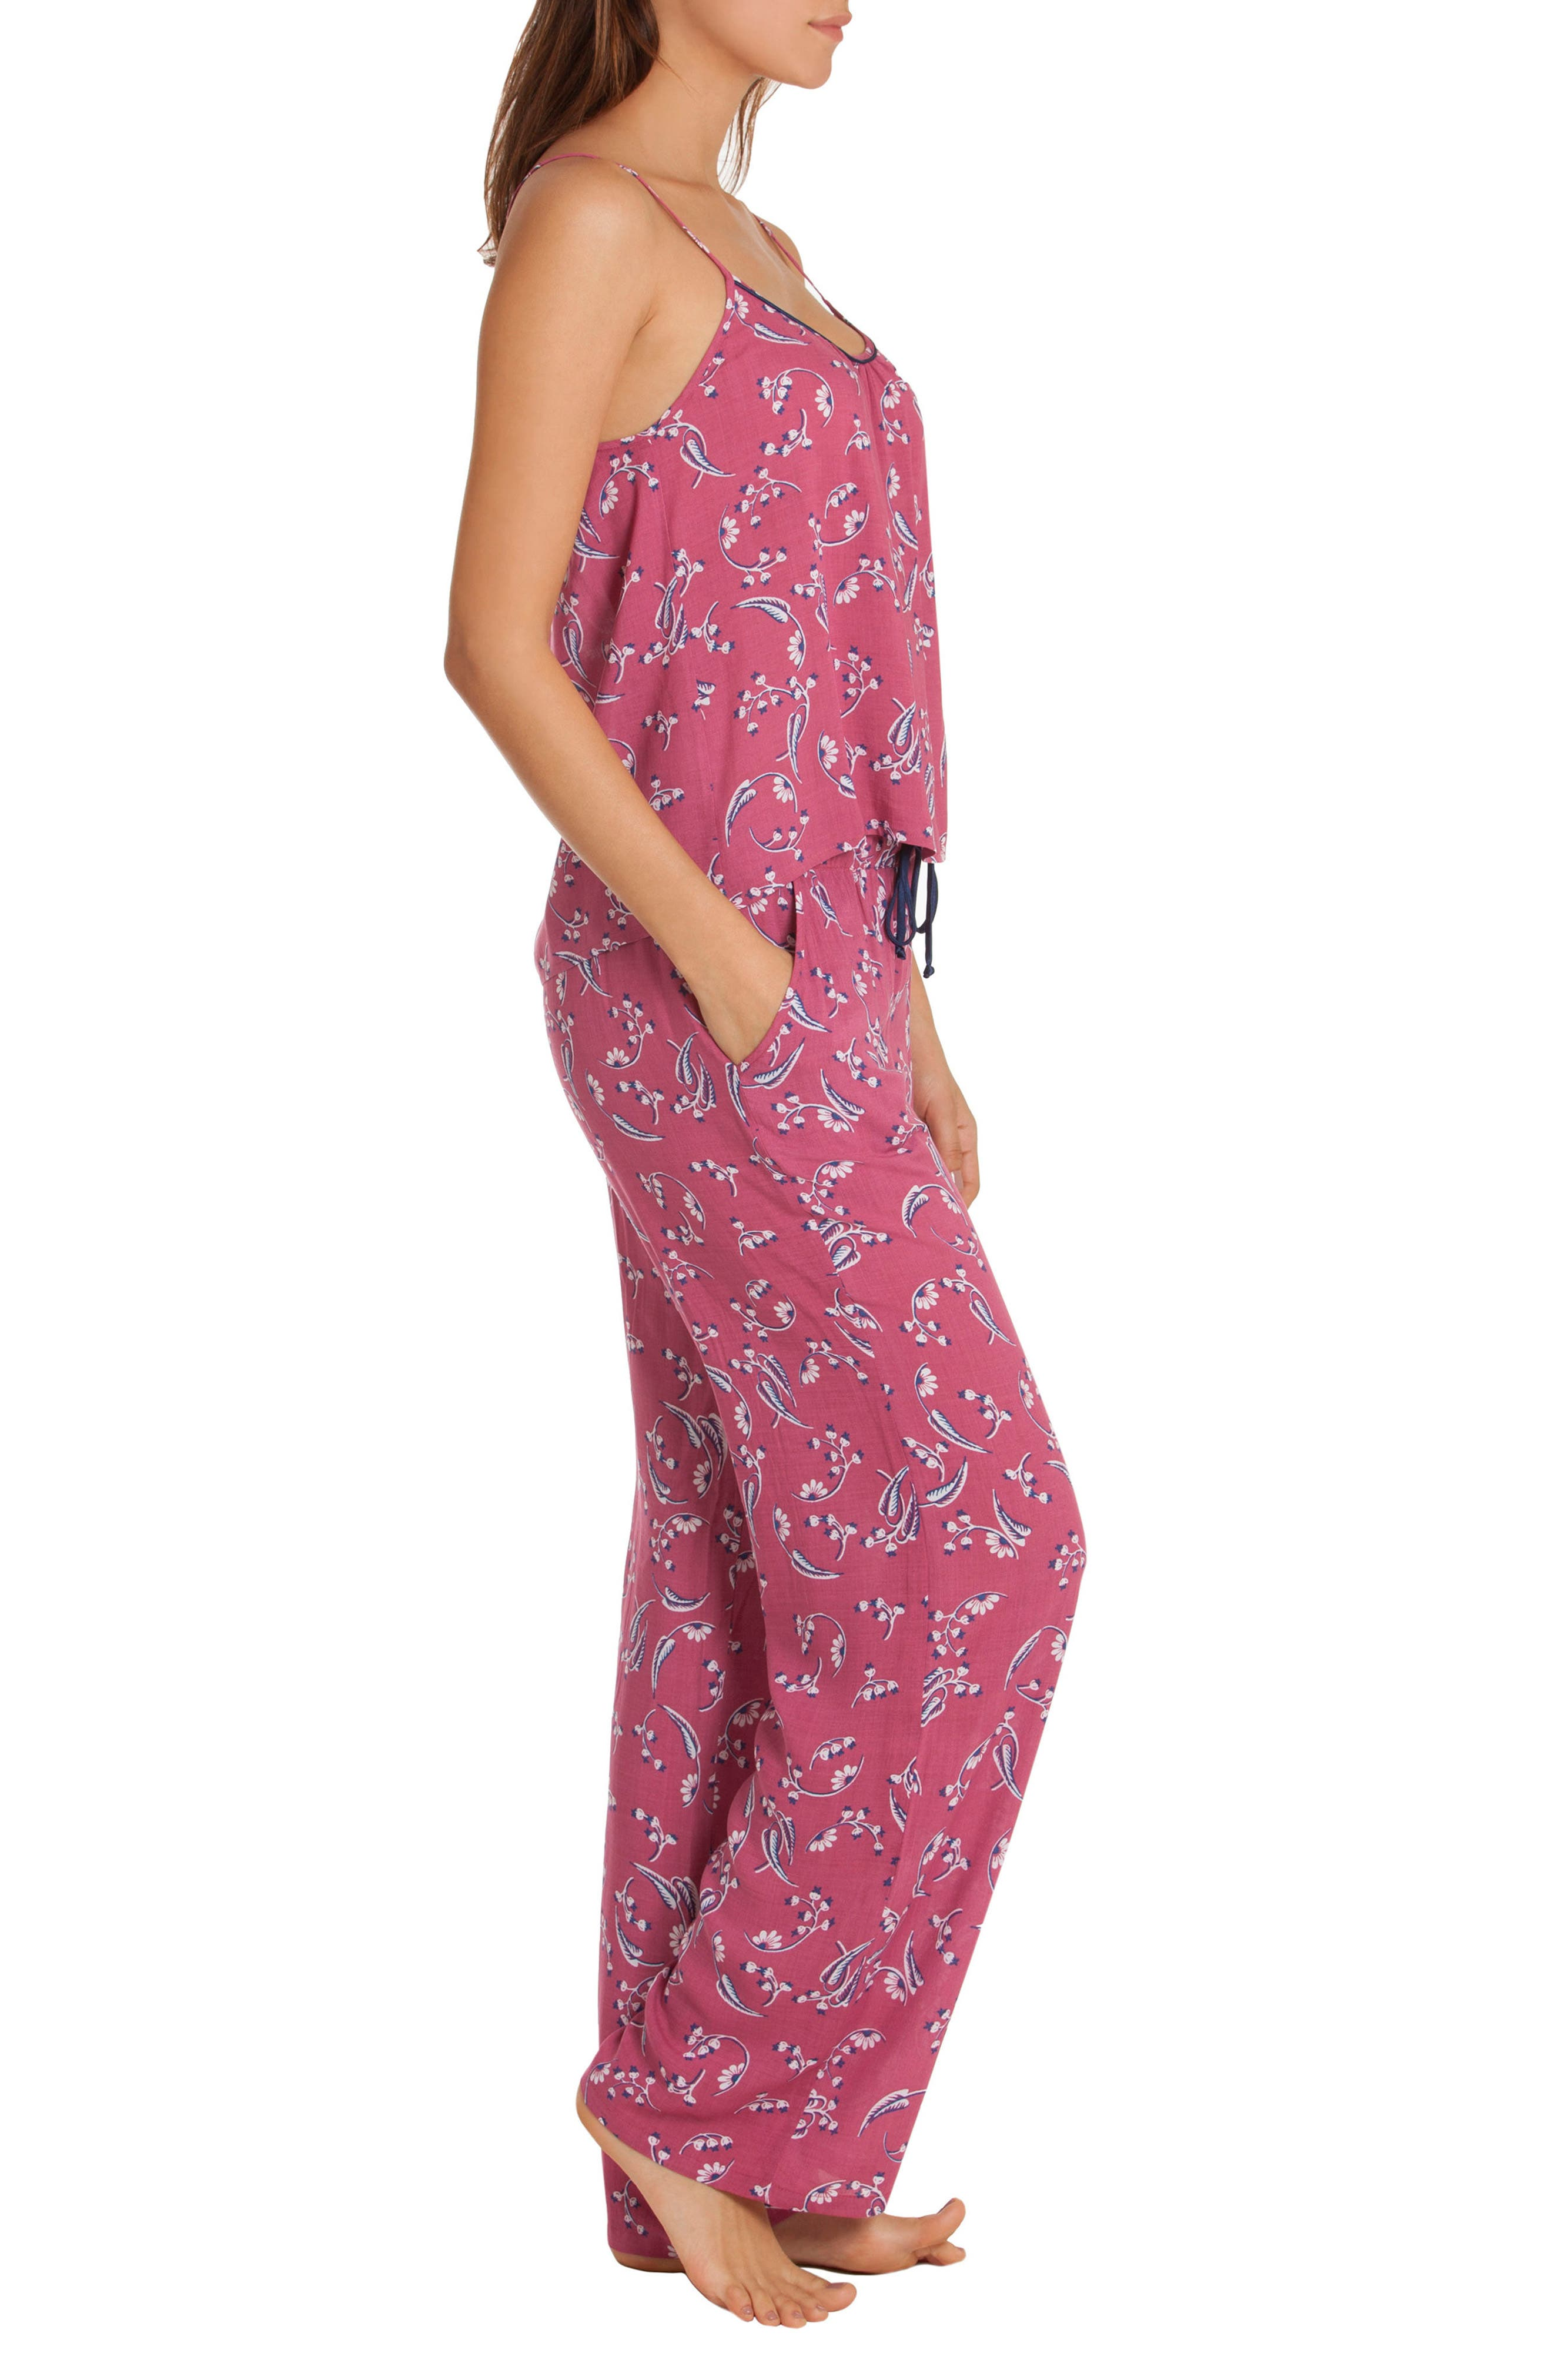 Floral Pajamas,                             Alternate thumbnail 3, color,                             651